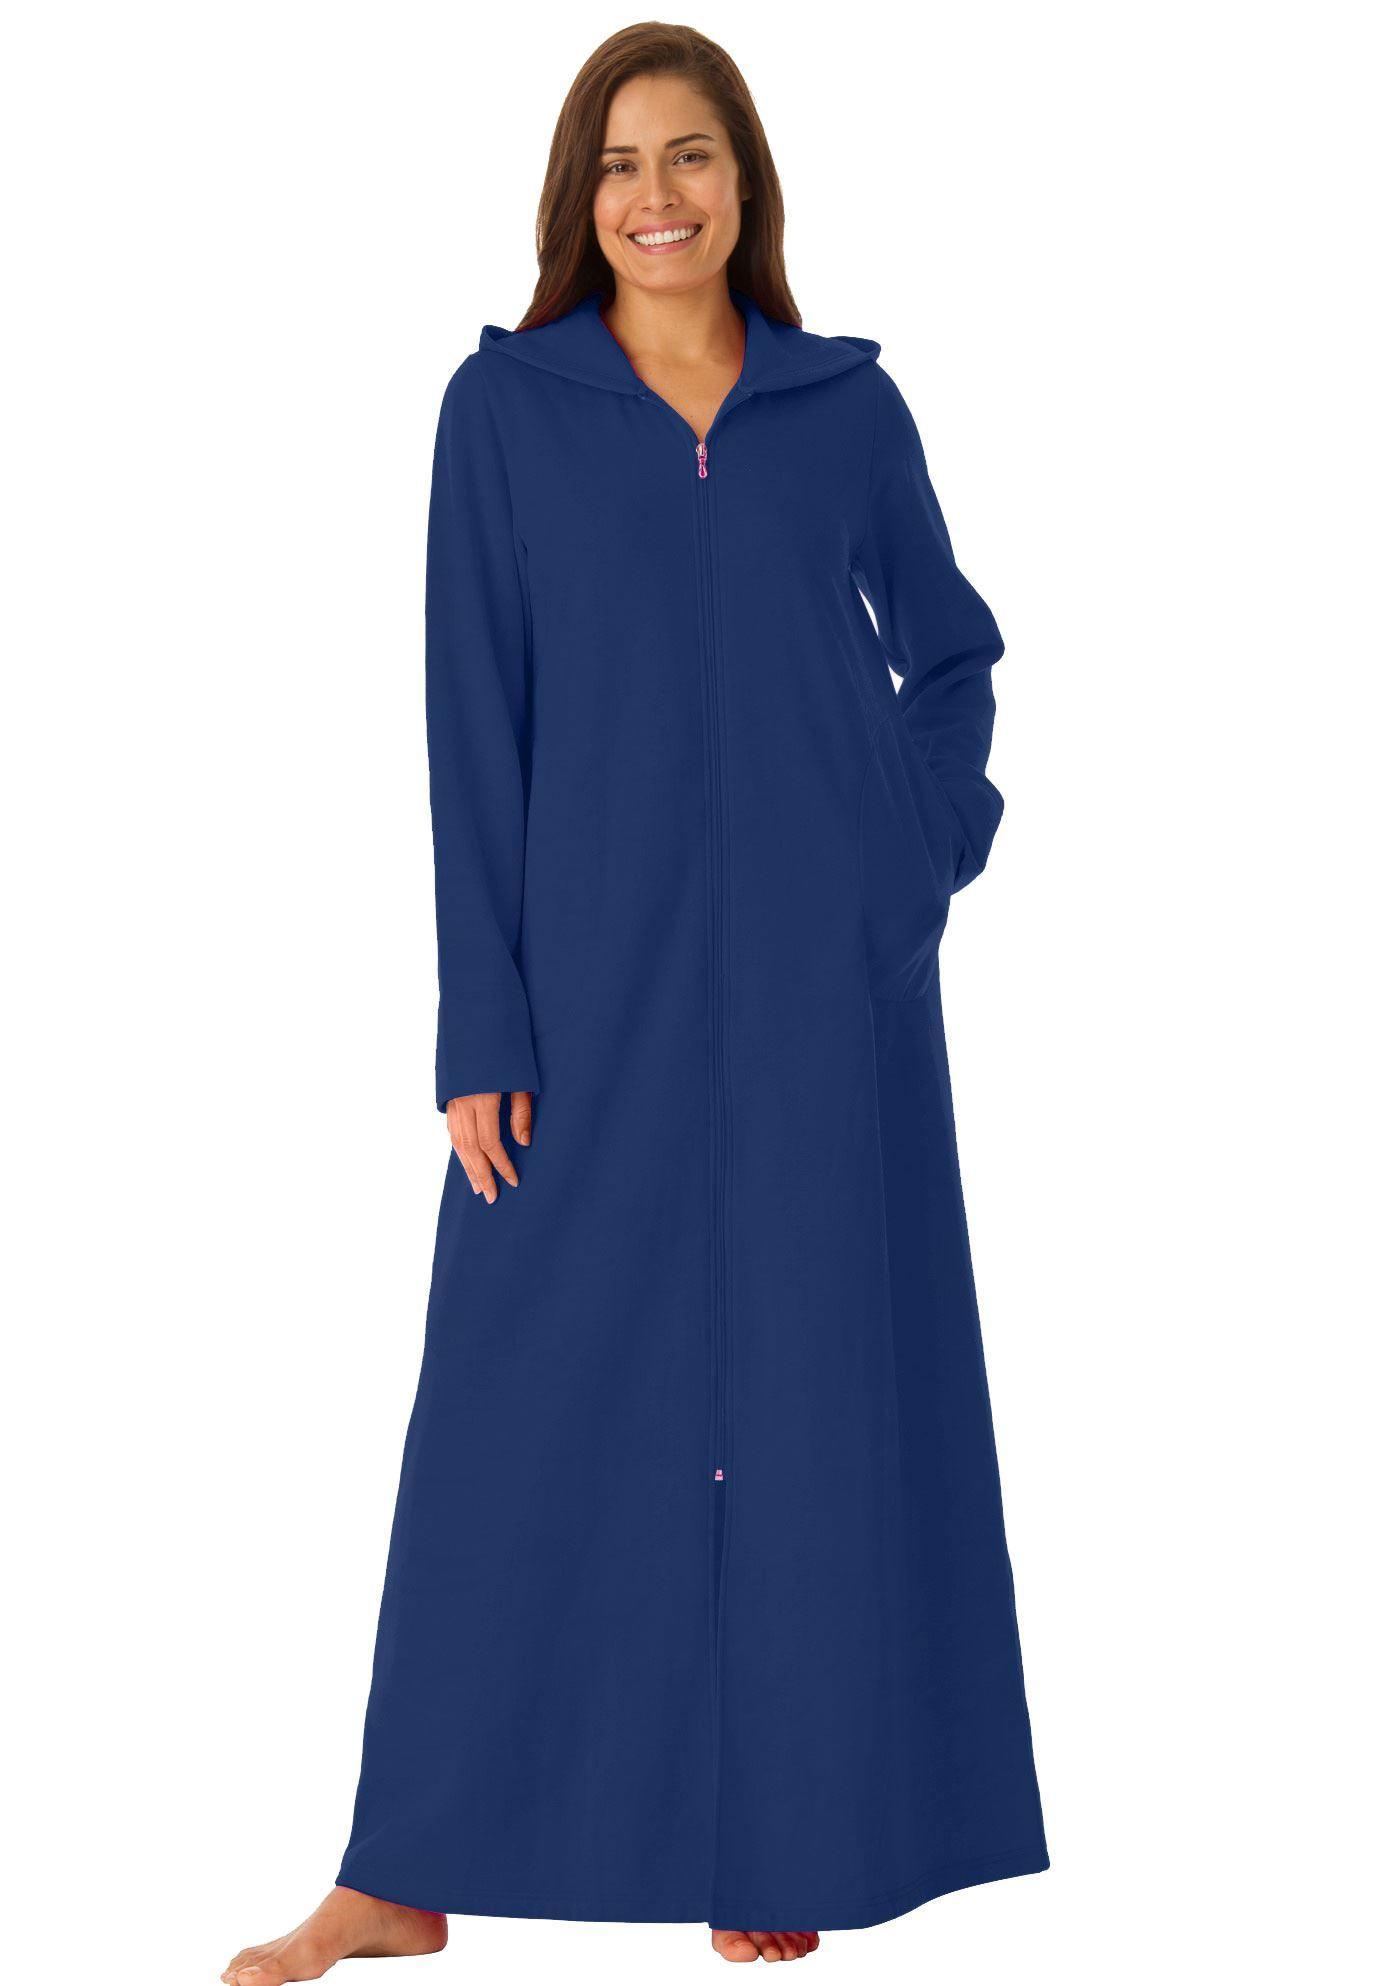 800c85c0cb1 Petite Hooded Fleece Robe by Dreams   Co. reg  - Women s Plus Size Clothing